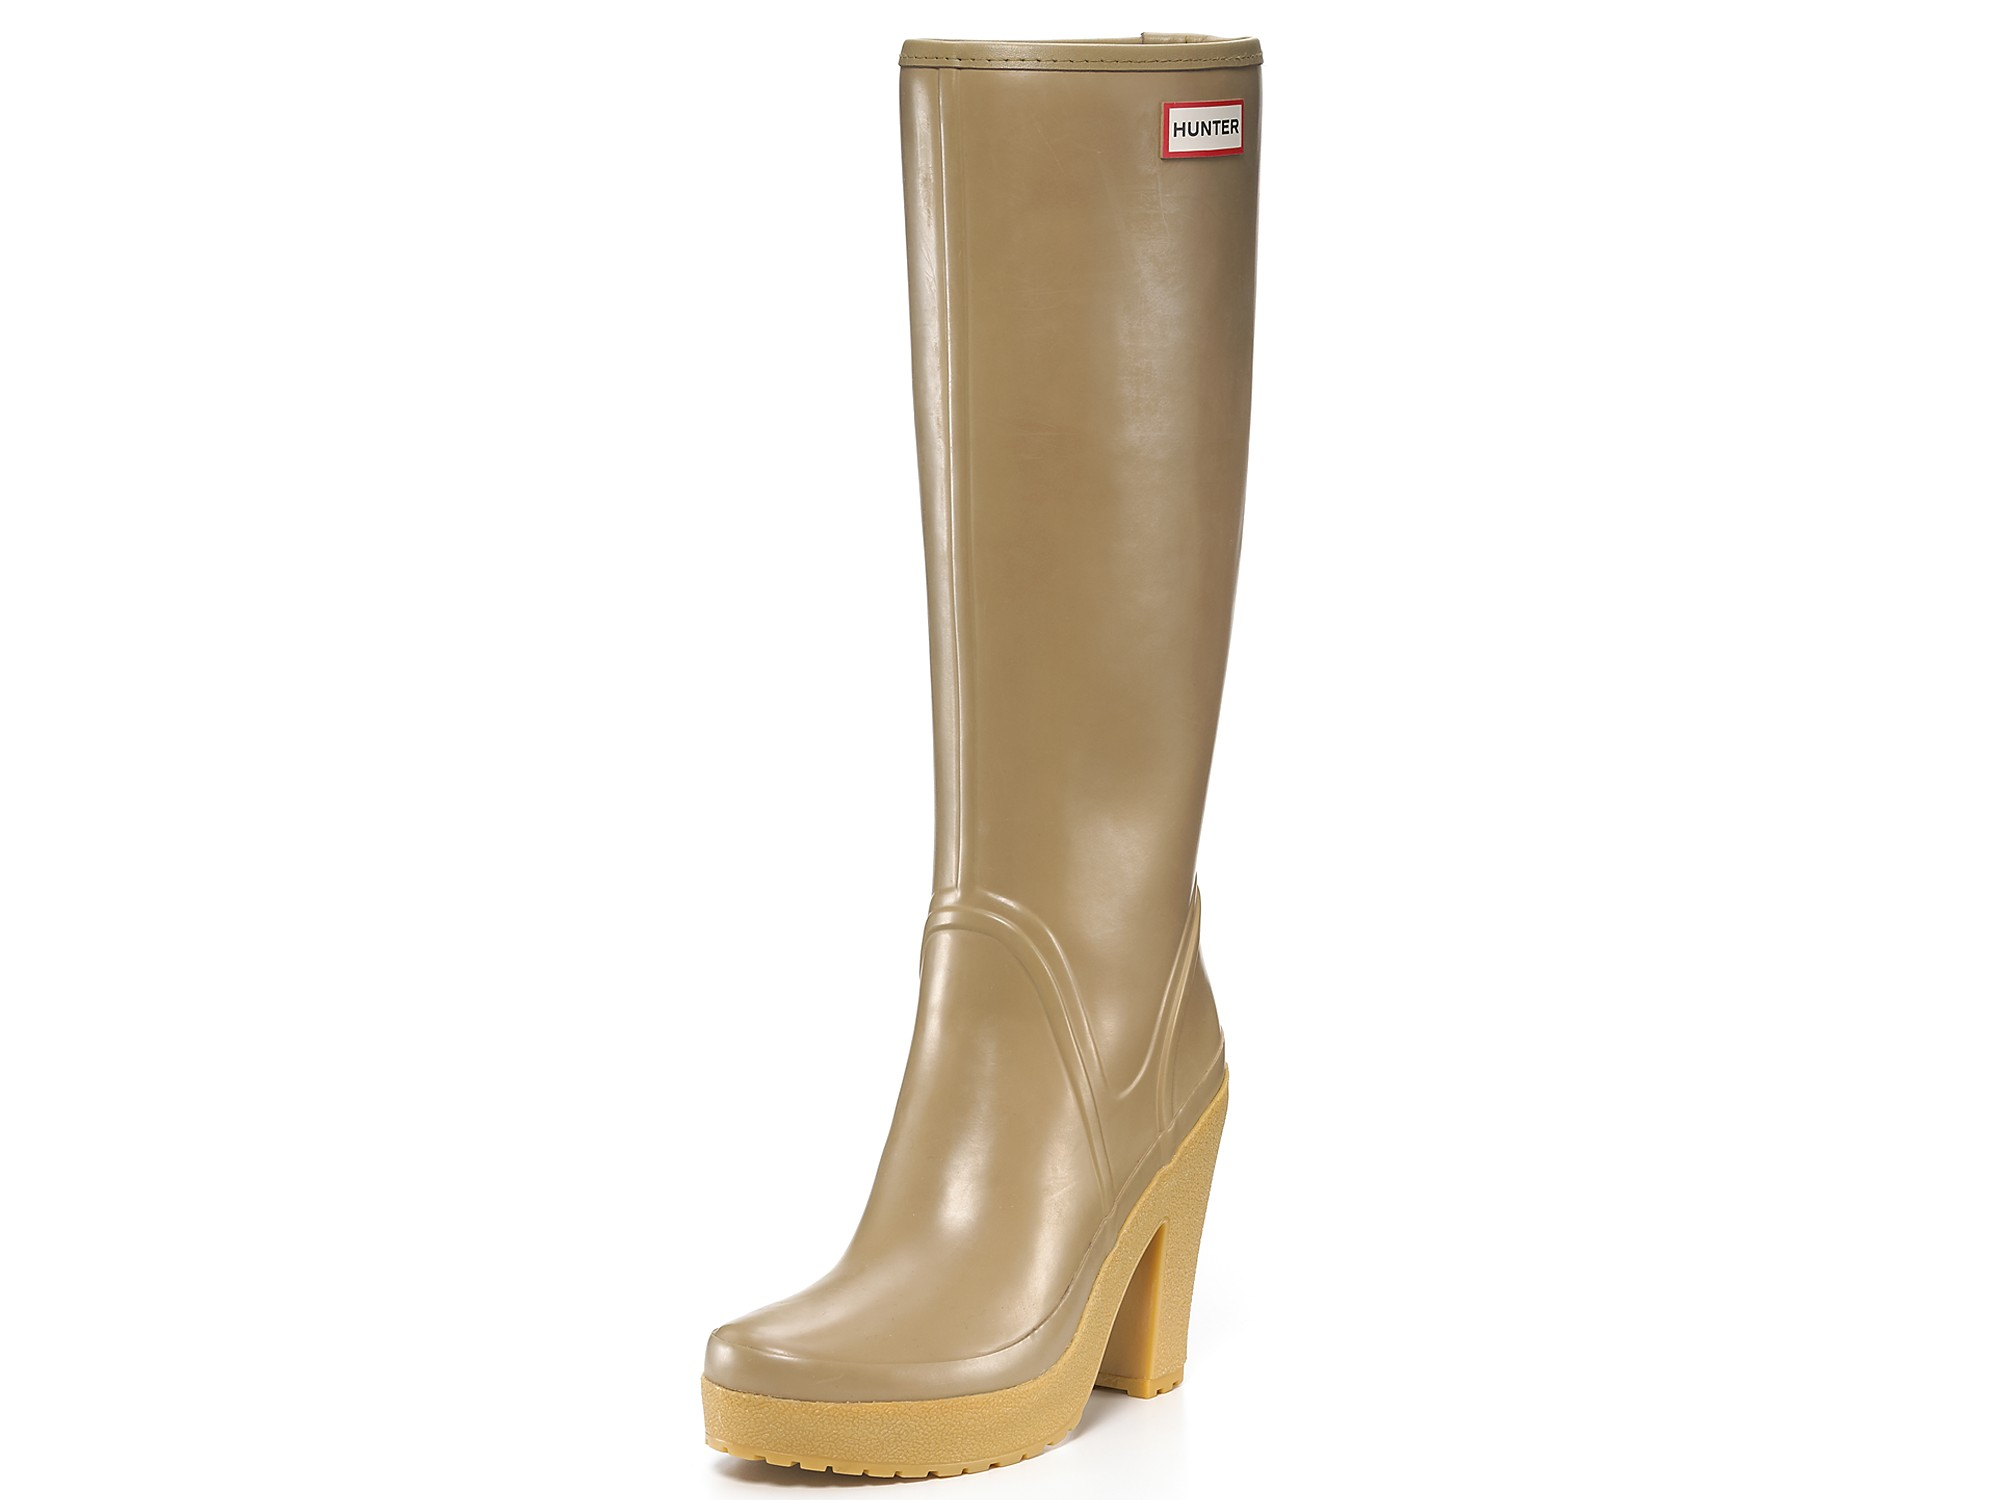 Lyst - Hunter Rain Boots Lonny High Heel In Green